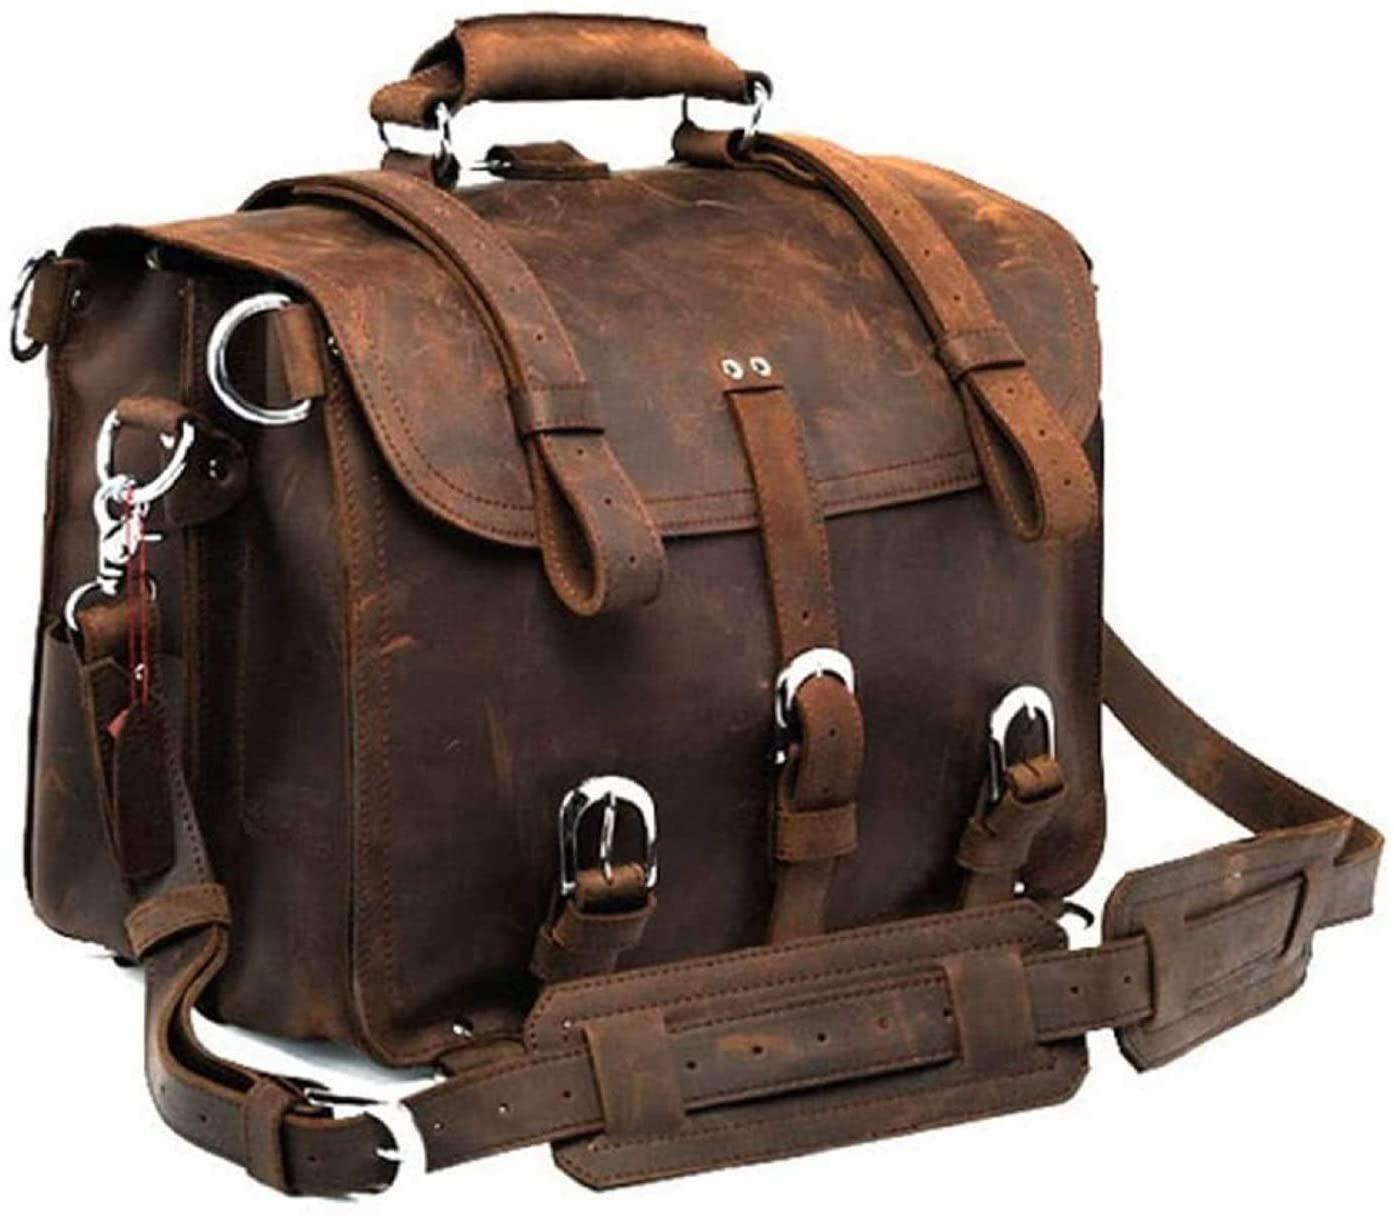 Full Grain Handmade Leather Laptop office Briefcase Shoulder Messenger Bag Dark brown (16 Inches)